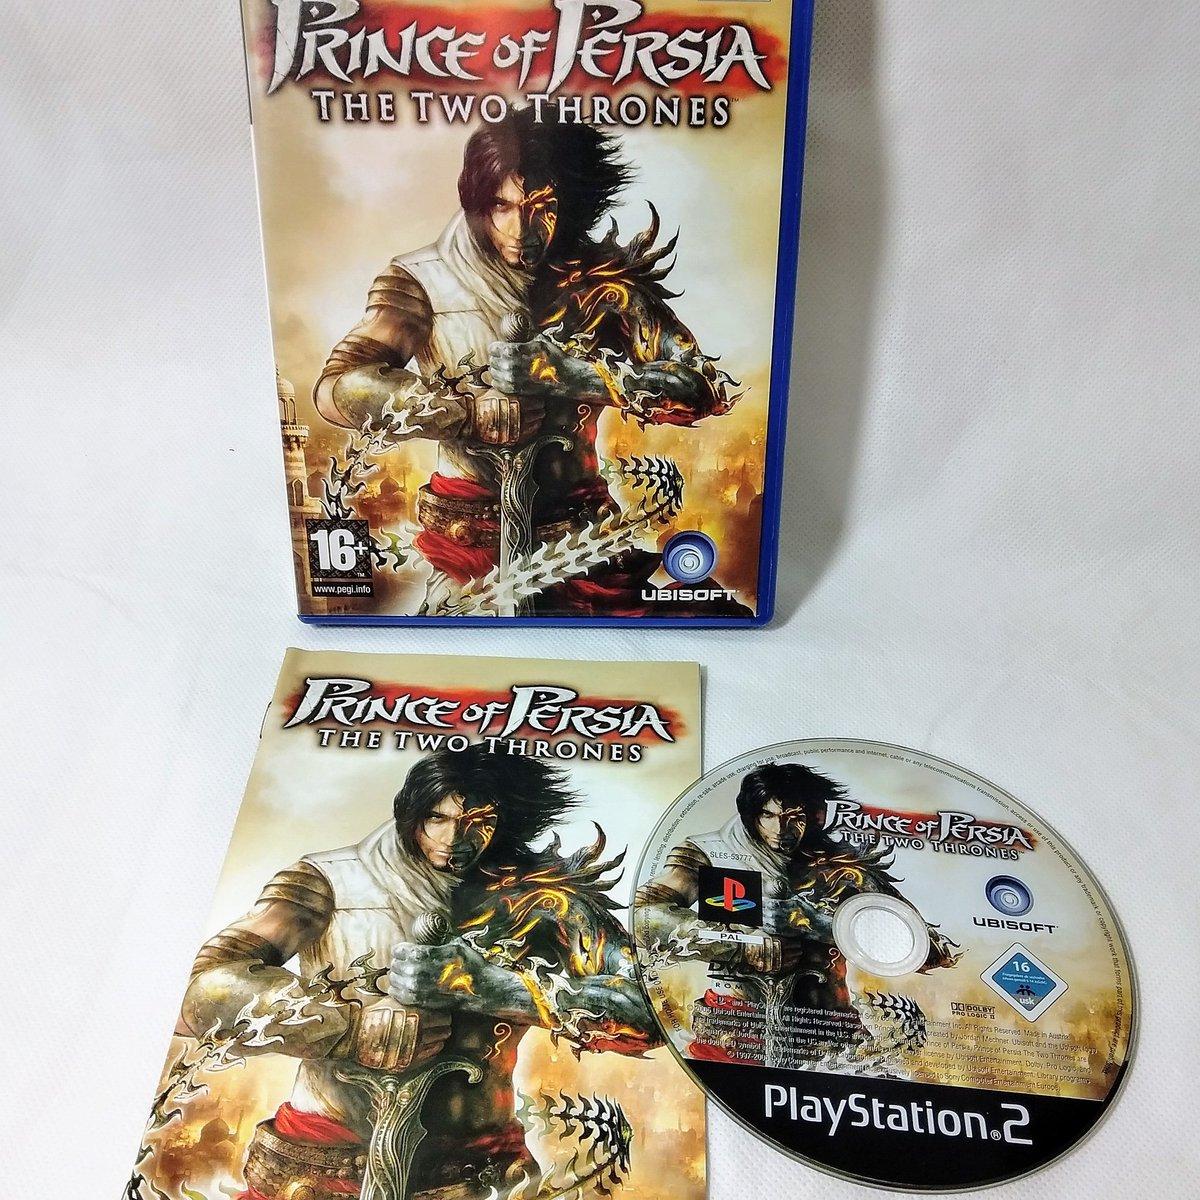 Prince of Persia: The Two Thrones (Sony PlayStation 2, 2005) - Includes Manual. Selling it on eBay!! #PlayStation2 #sony #princeofpersia #00s #games #gamer #ps2gamer #GamingLife #gamingcommuity #ebaycommunity #ebayuk #ebay #ebayseller #sellinggames